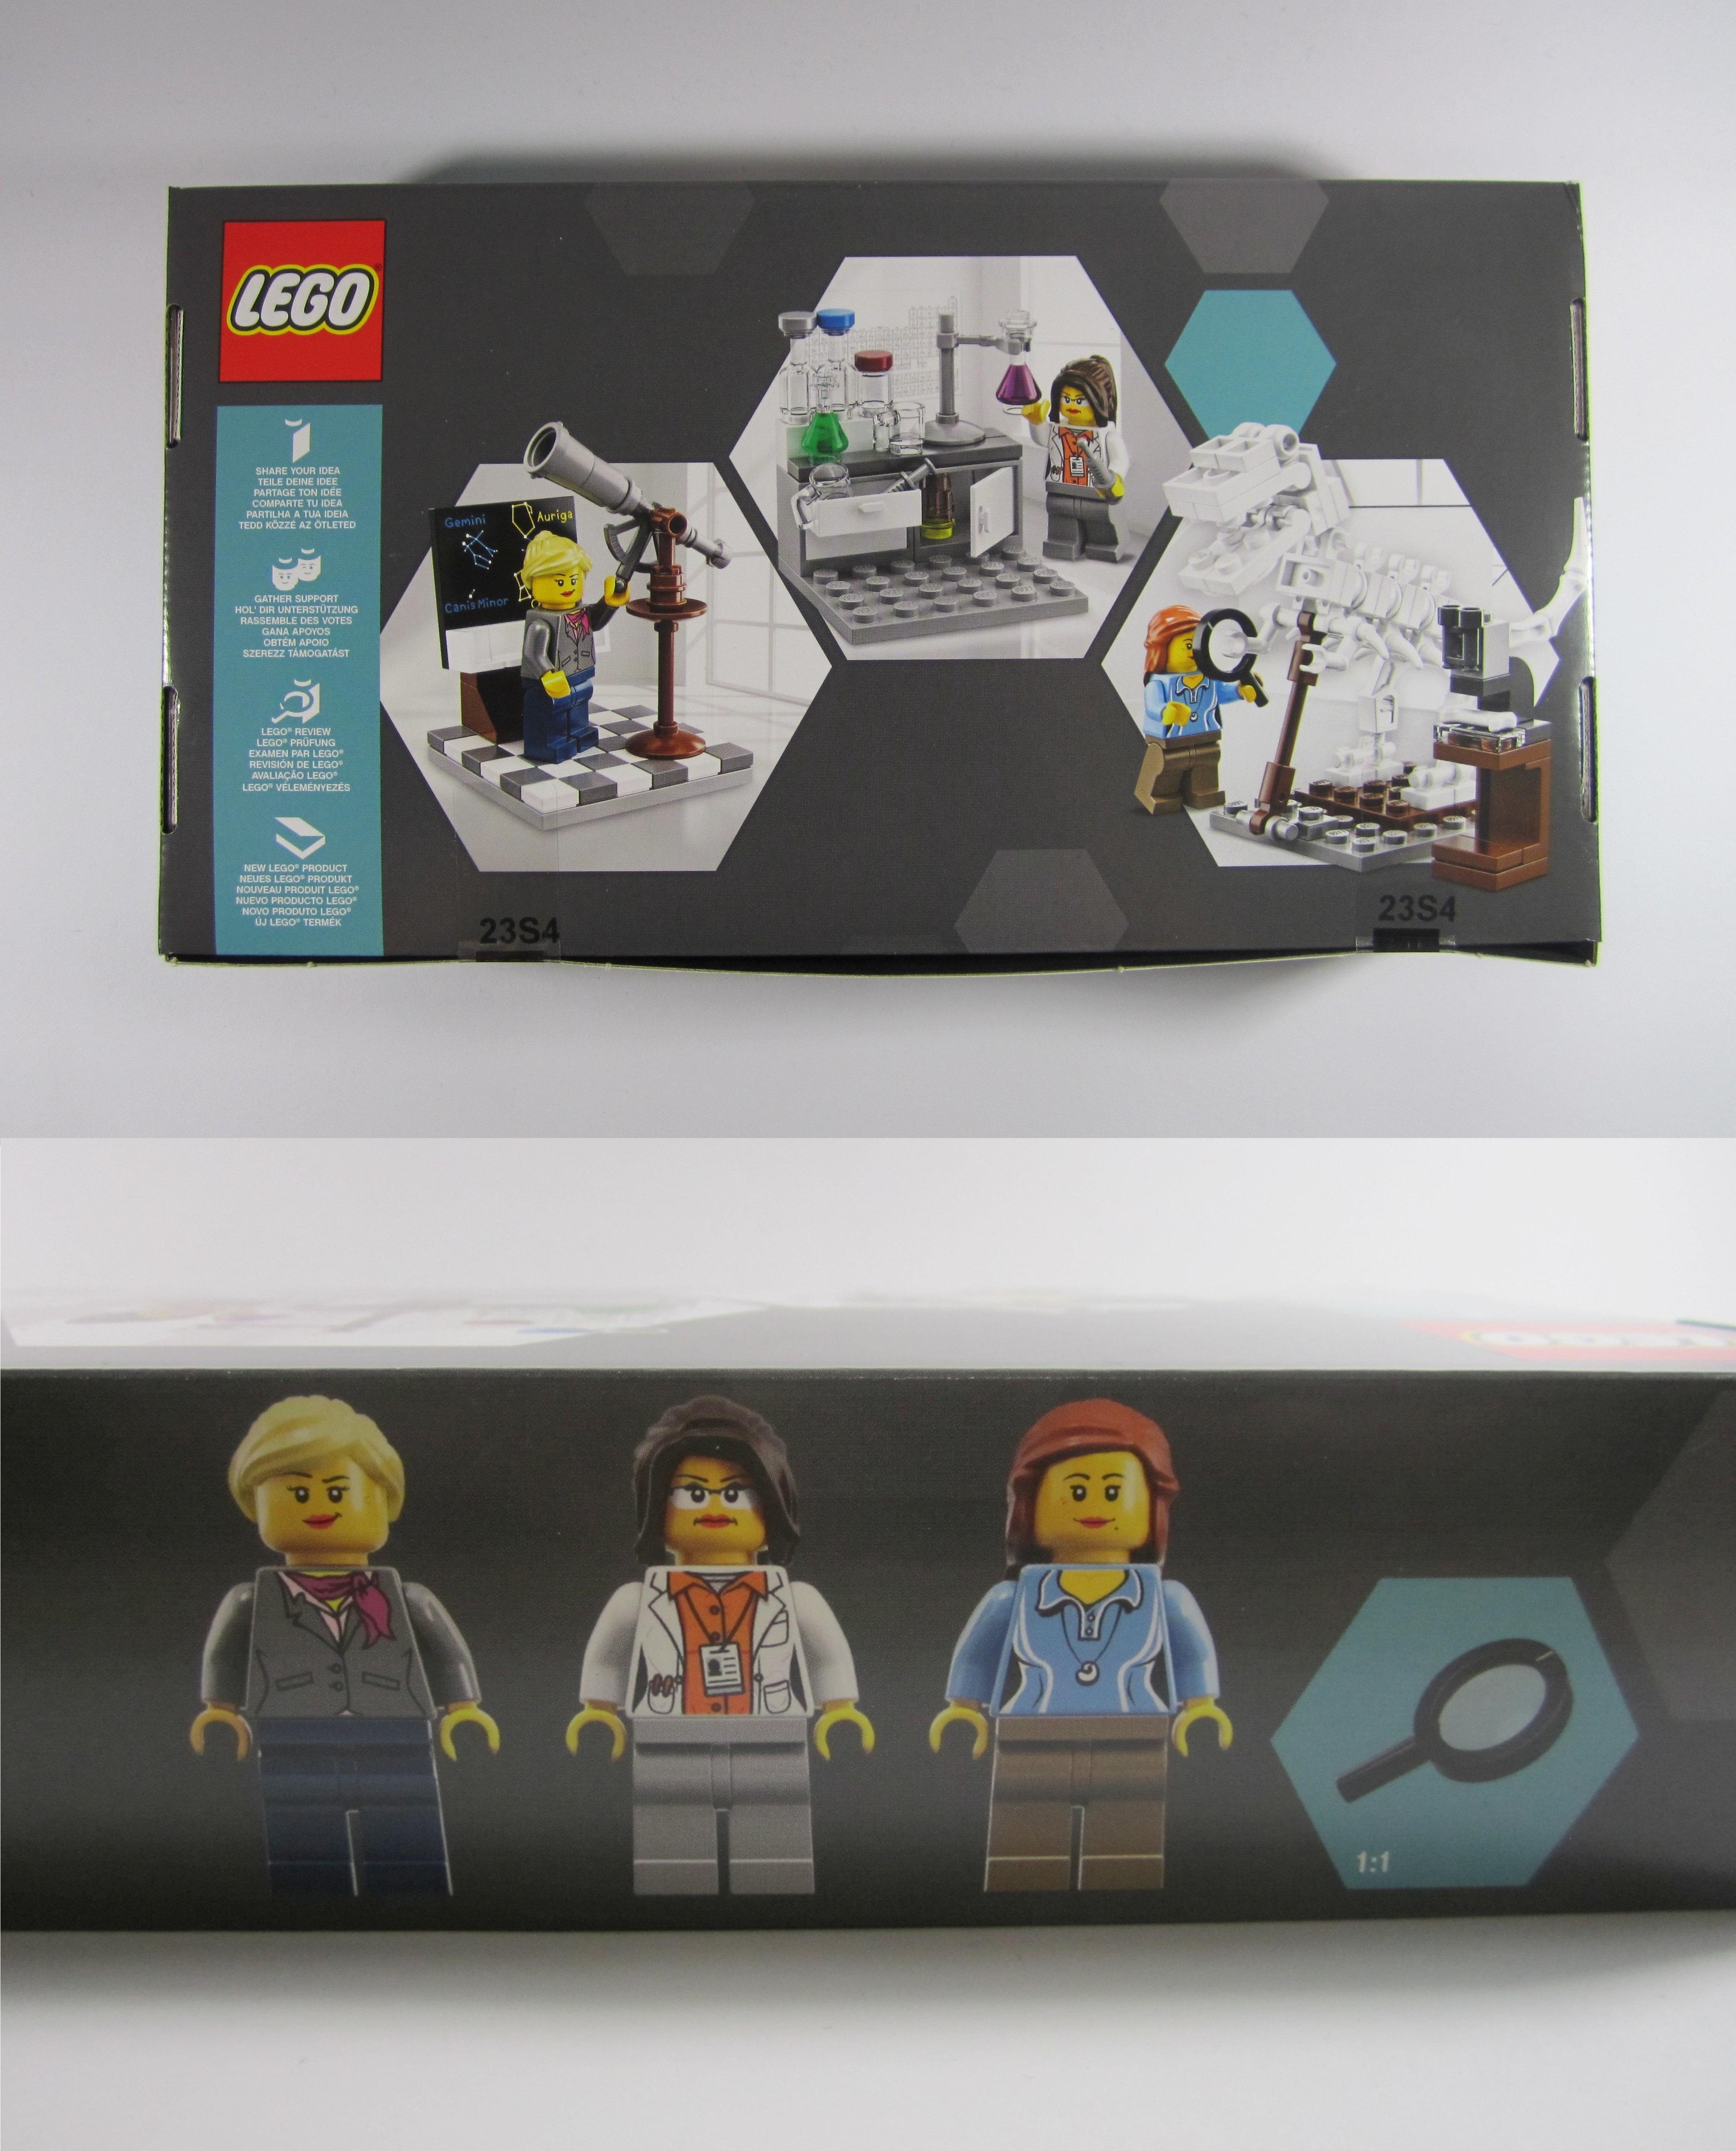 ... gear playground educational building block toy kid xmas gift | eBay